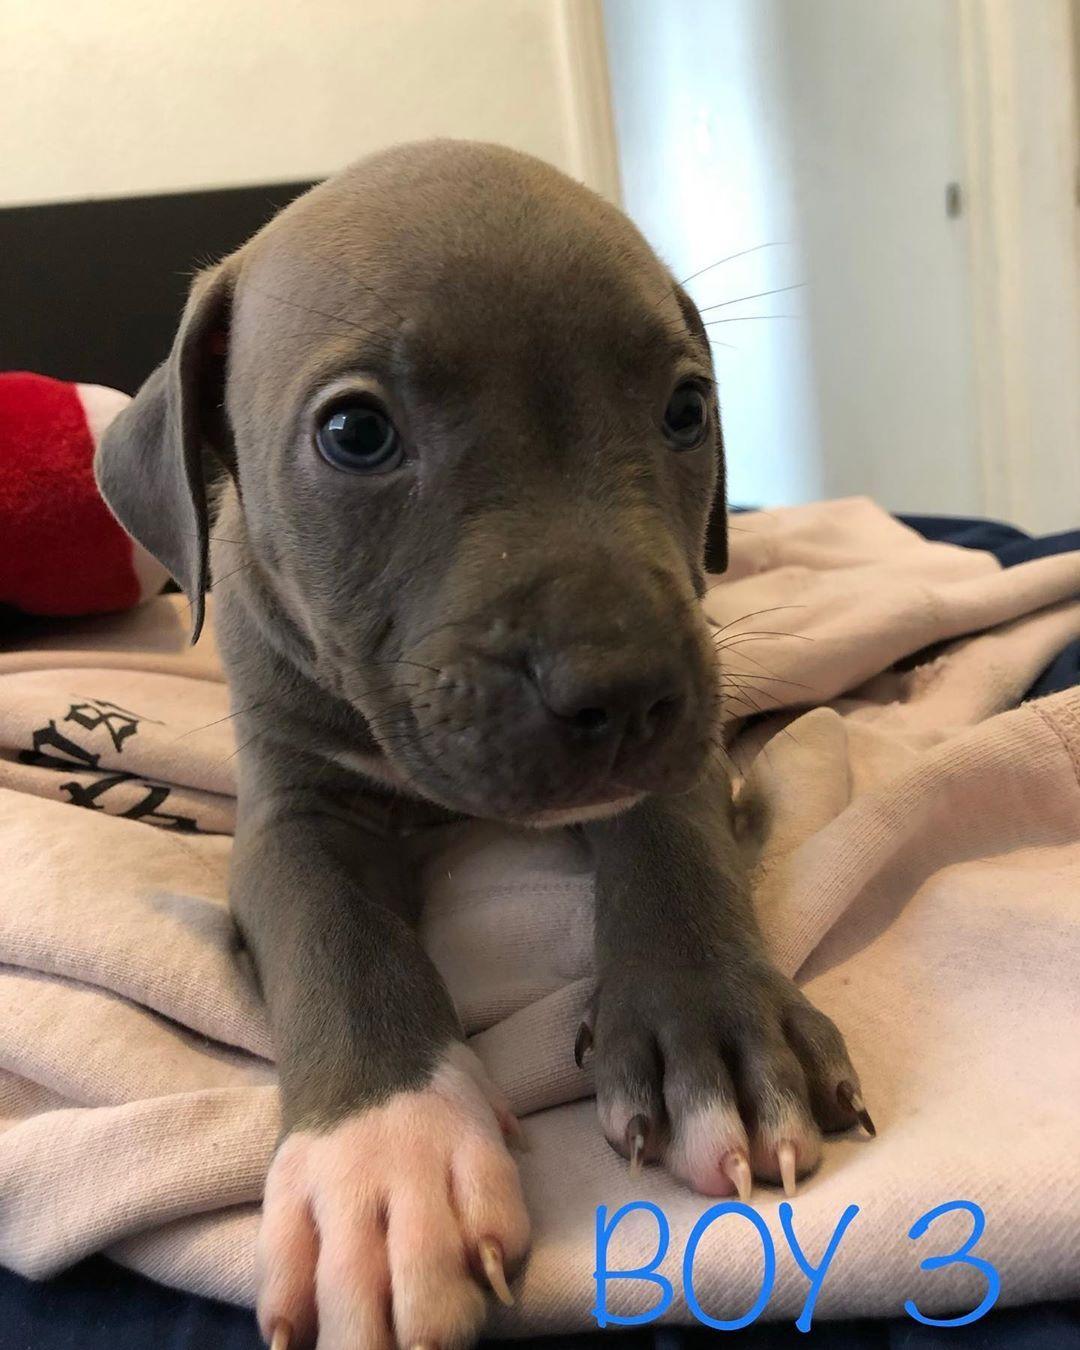 How To Train A Pitbull Puppy Pitbull Puppy Puppies Pitbull